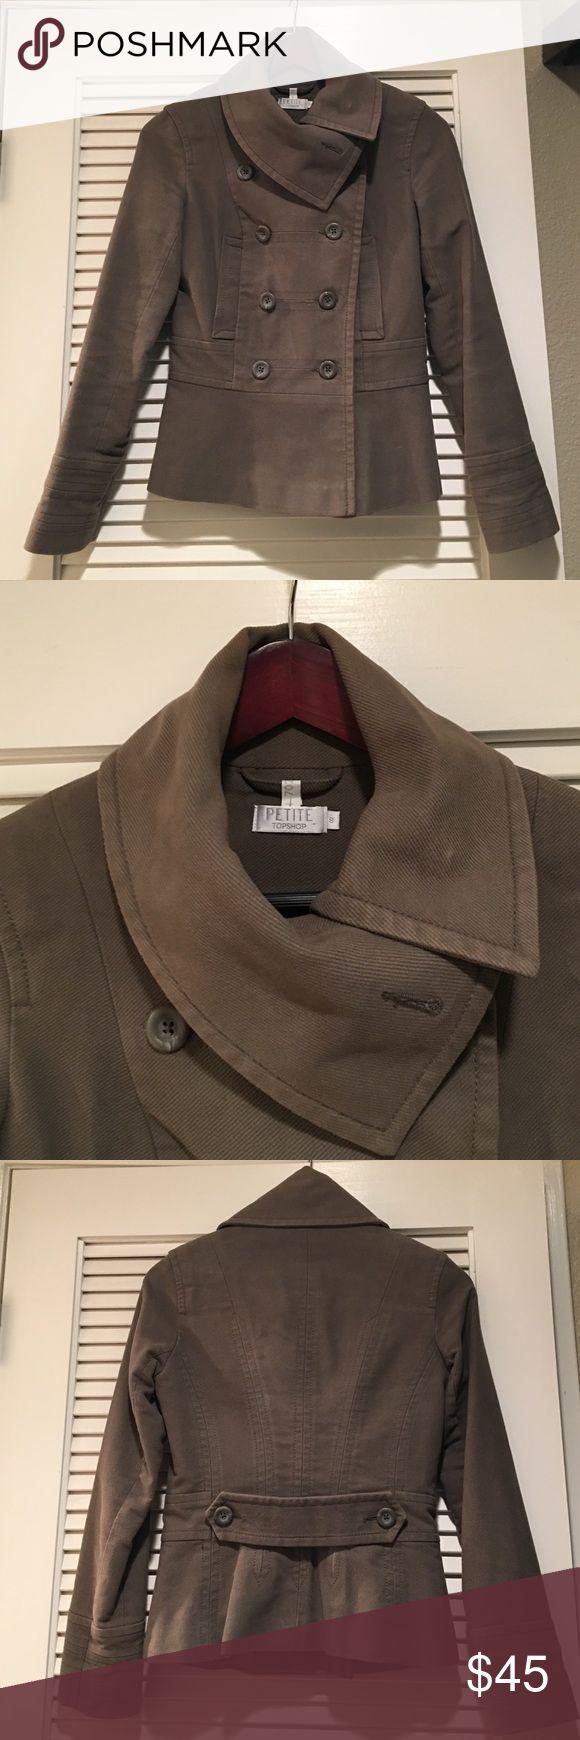 Topshop jacket in petite size 8 Topshop jacket in petite size 8 Topshop PETITE Jackets & Coats Blazers